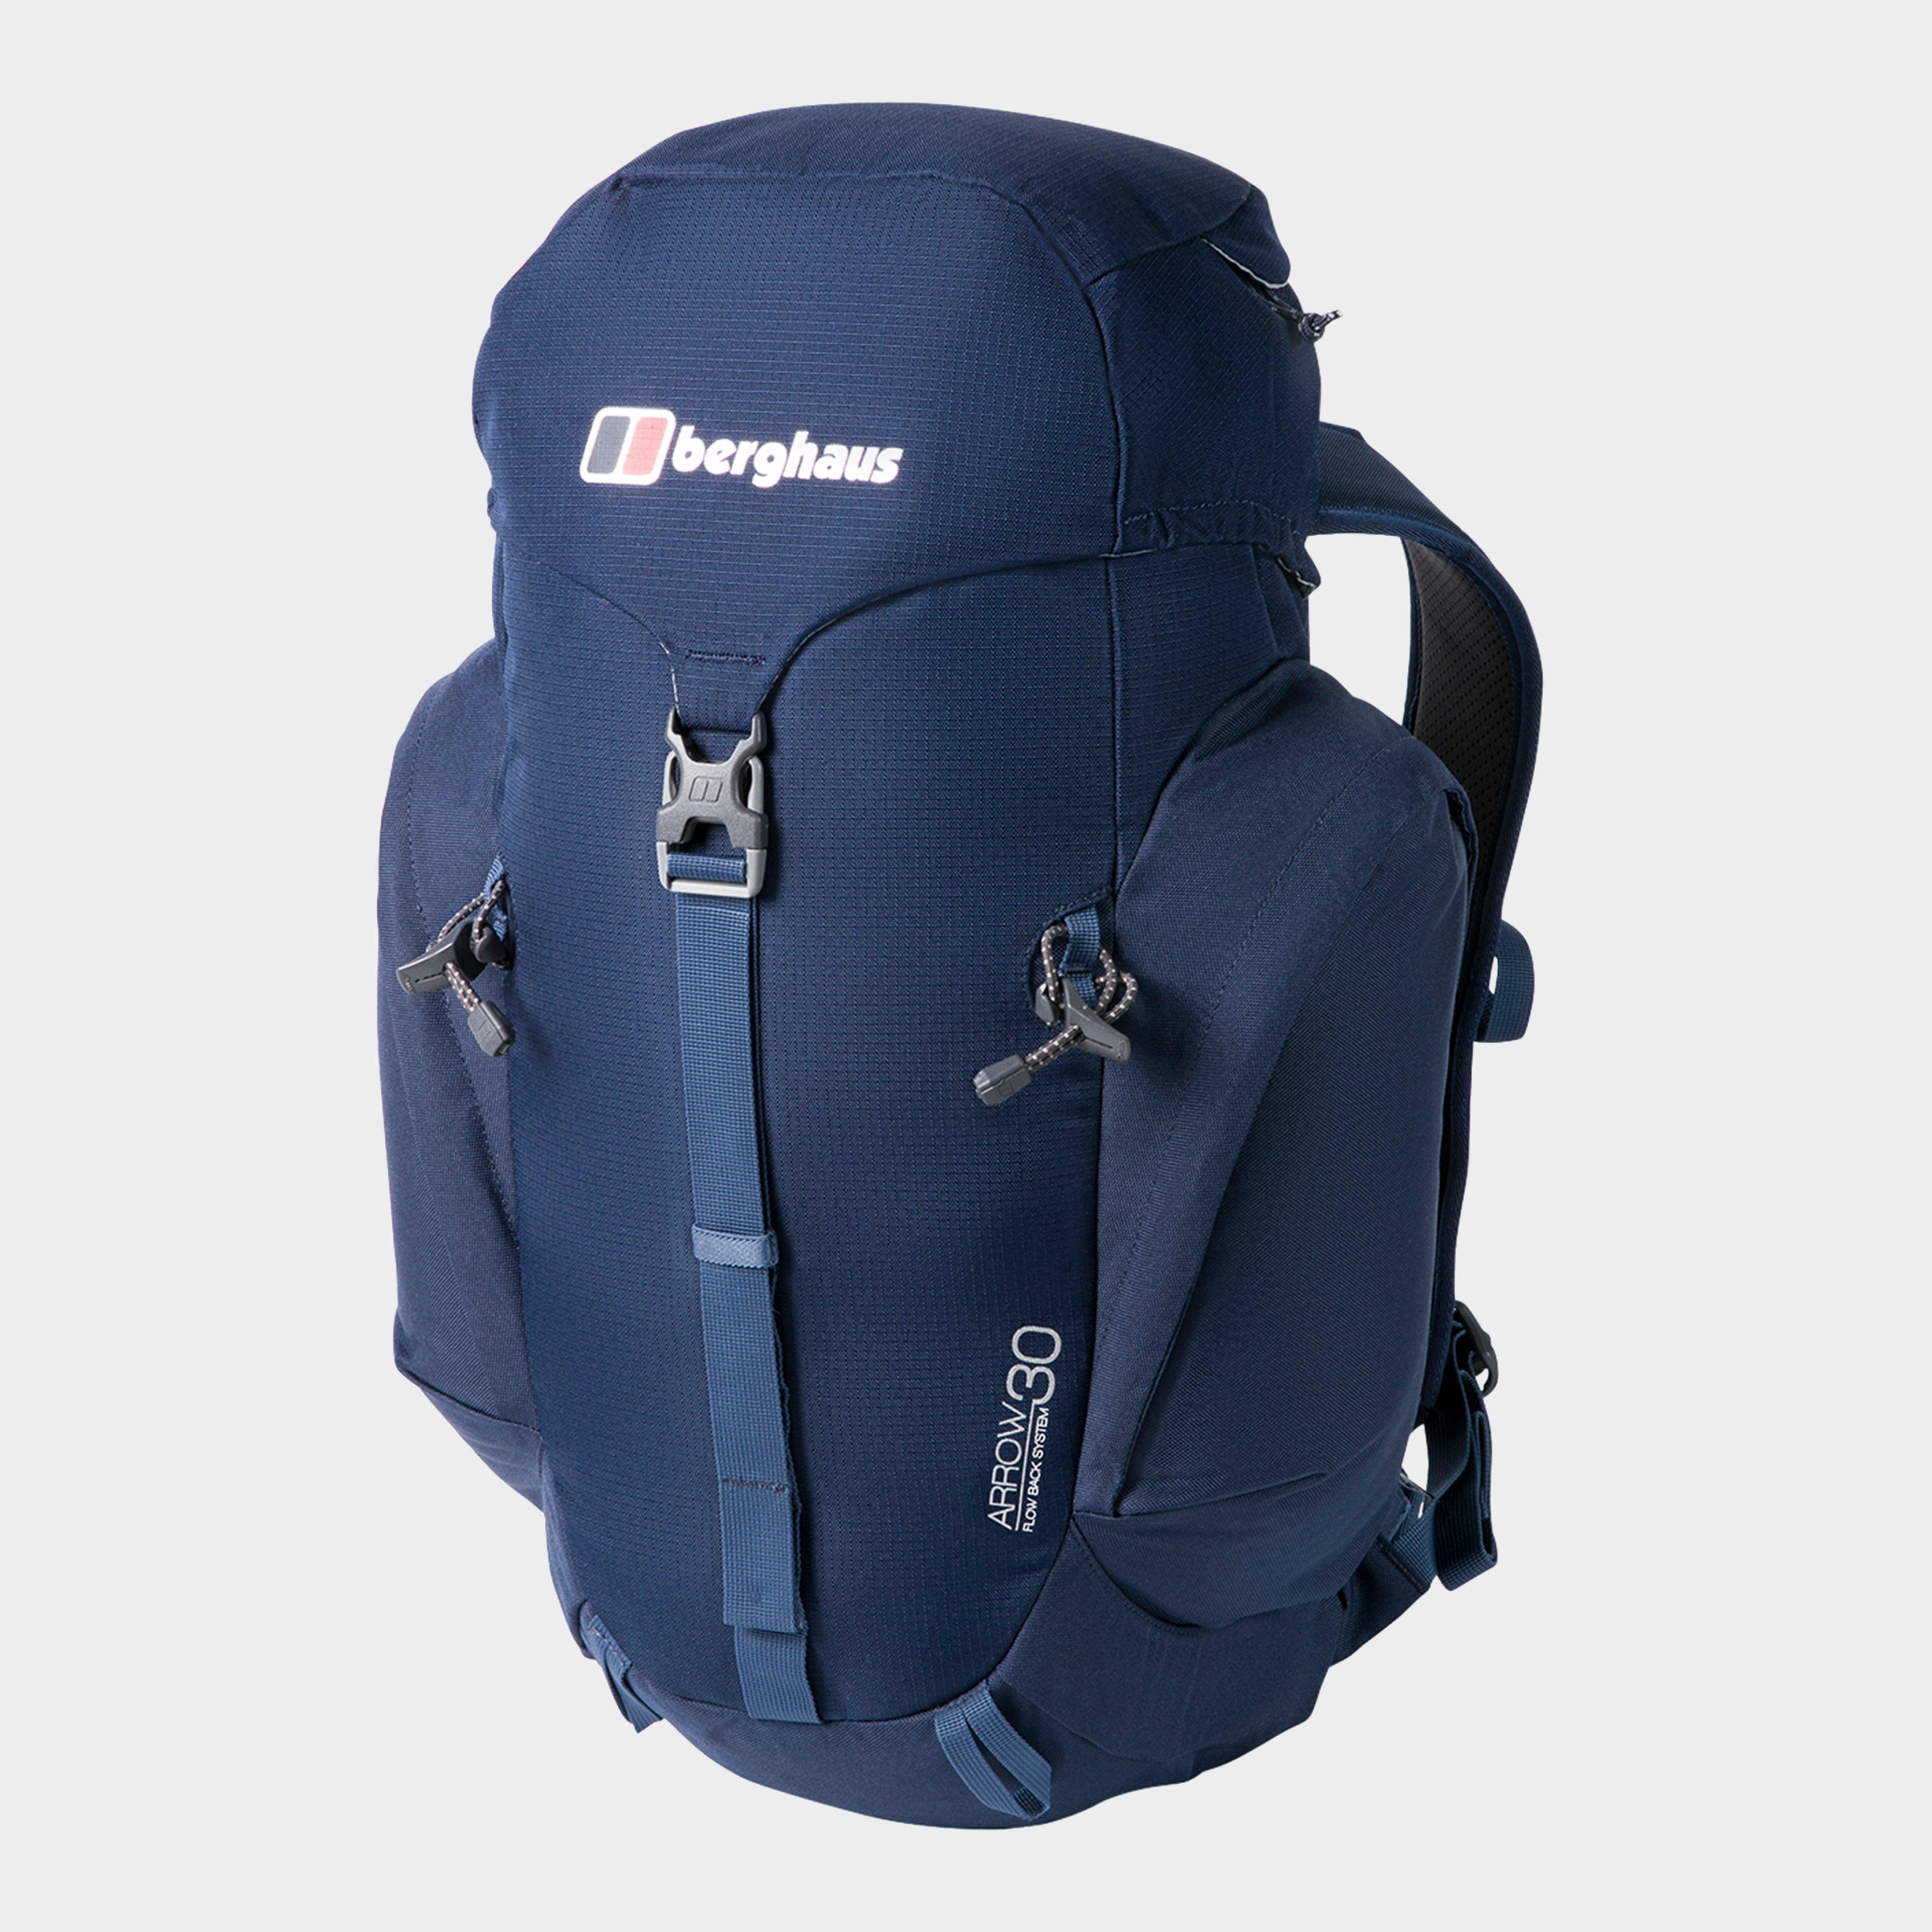 Berghaus Arrow 30l Backpack - Navy  Navy